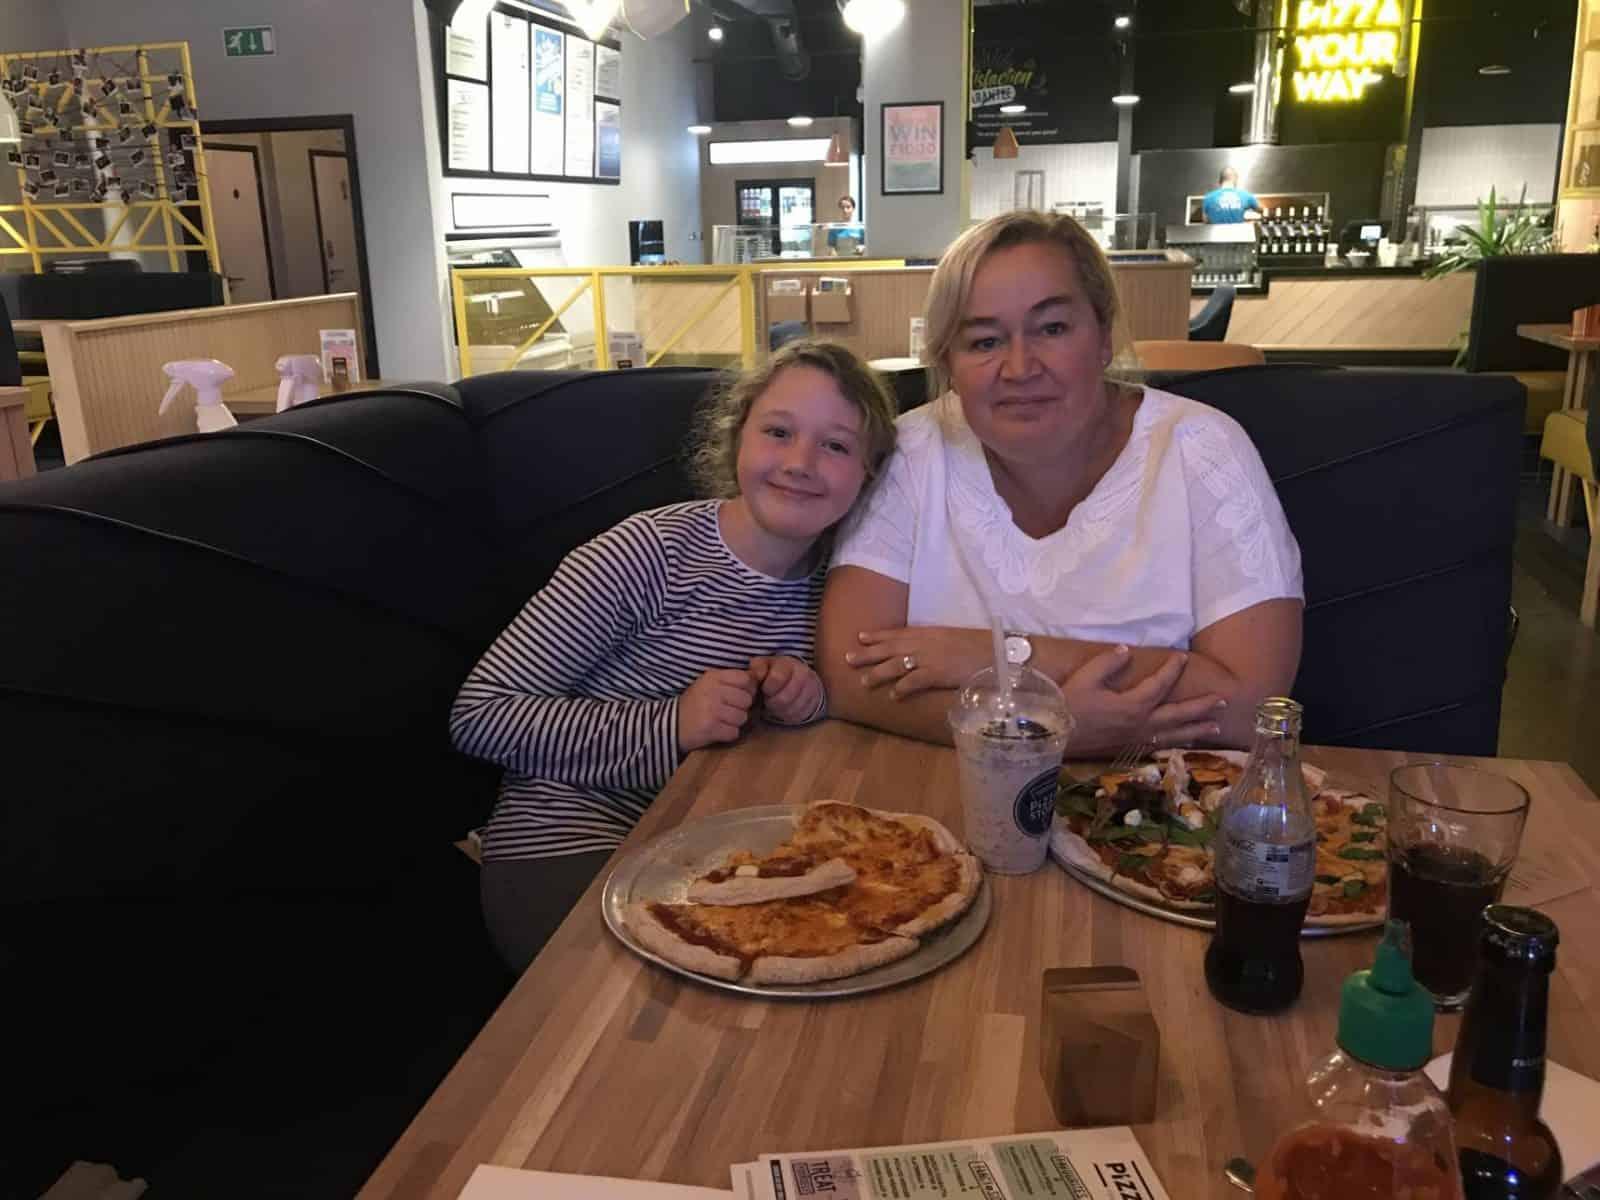 PizzaStorm, PizzaStorm Review, Becky Goddard-Hill